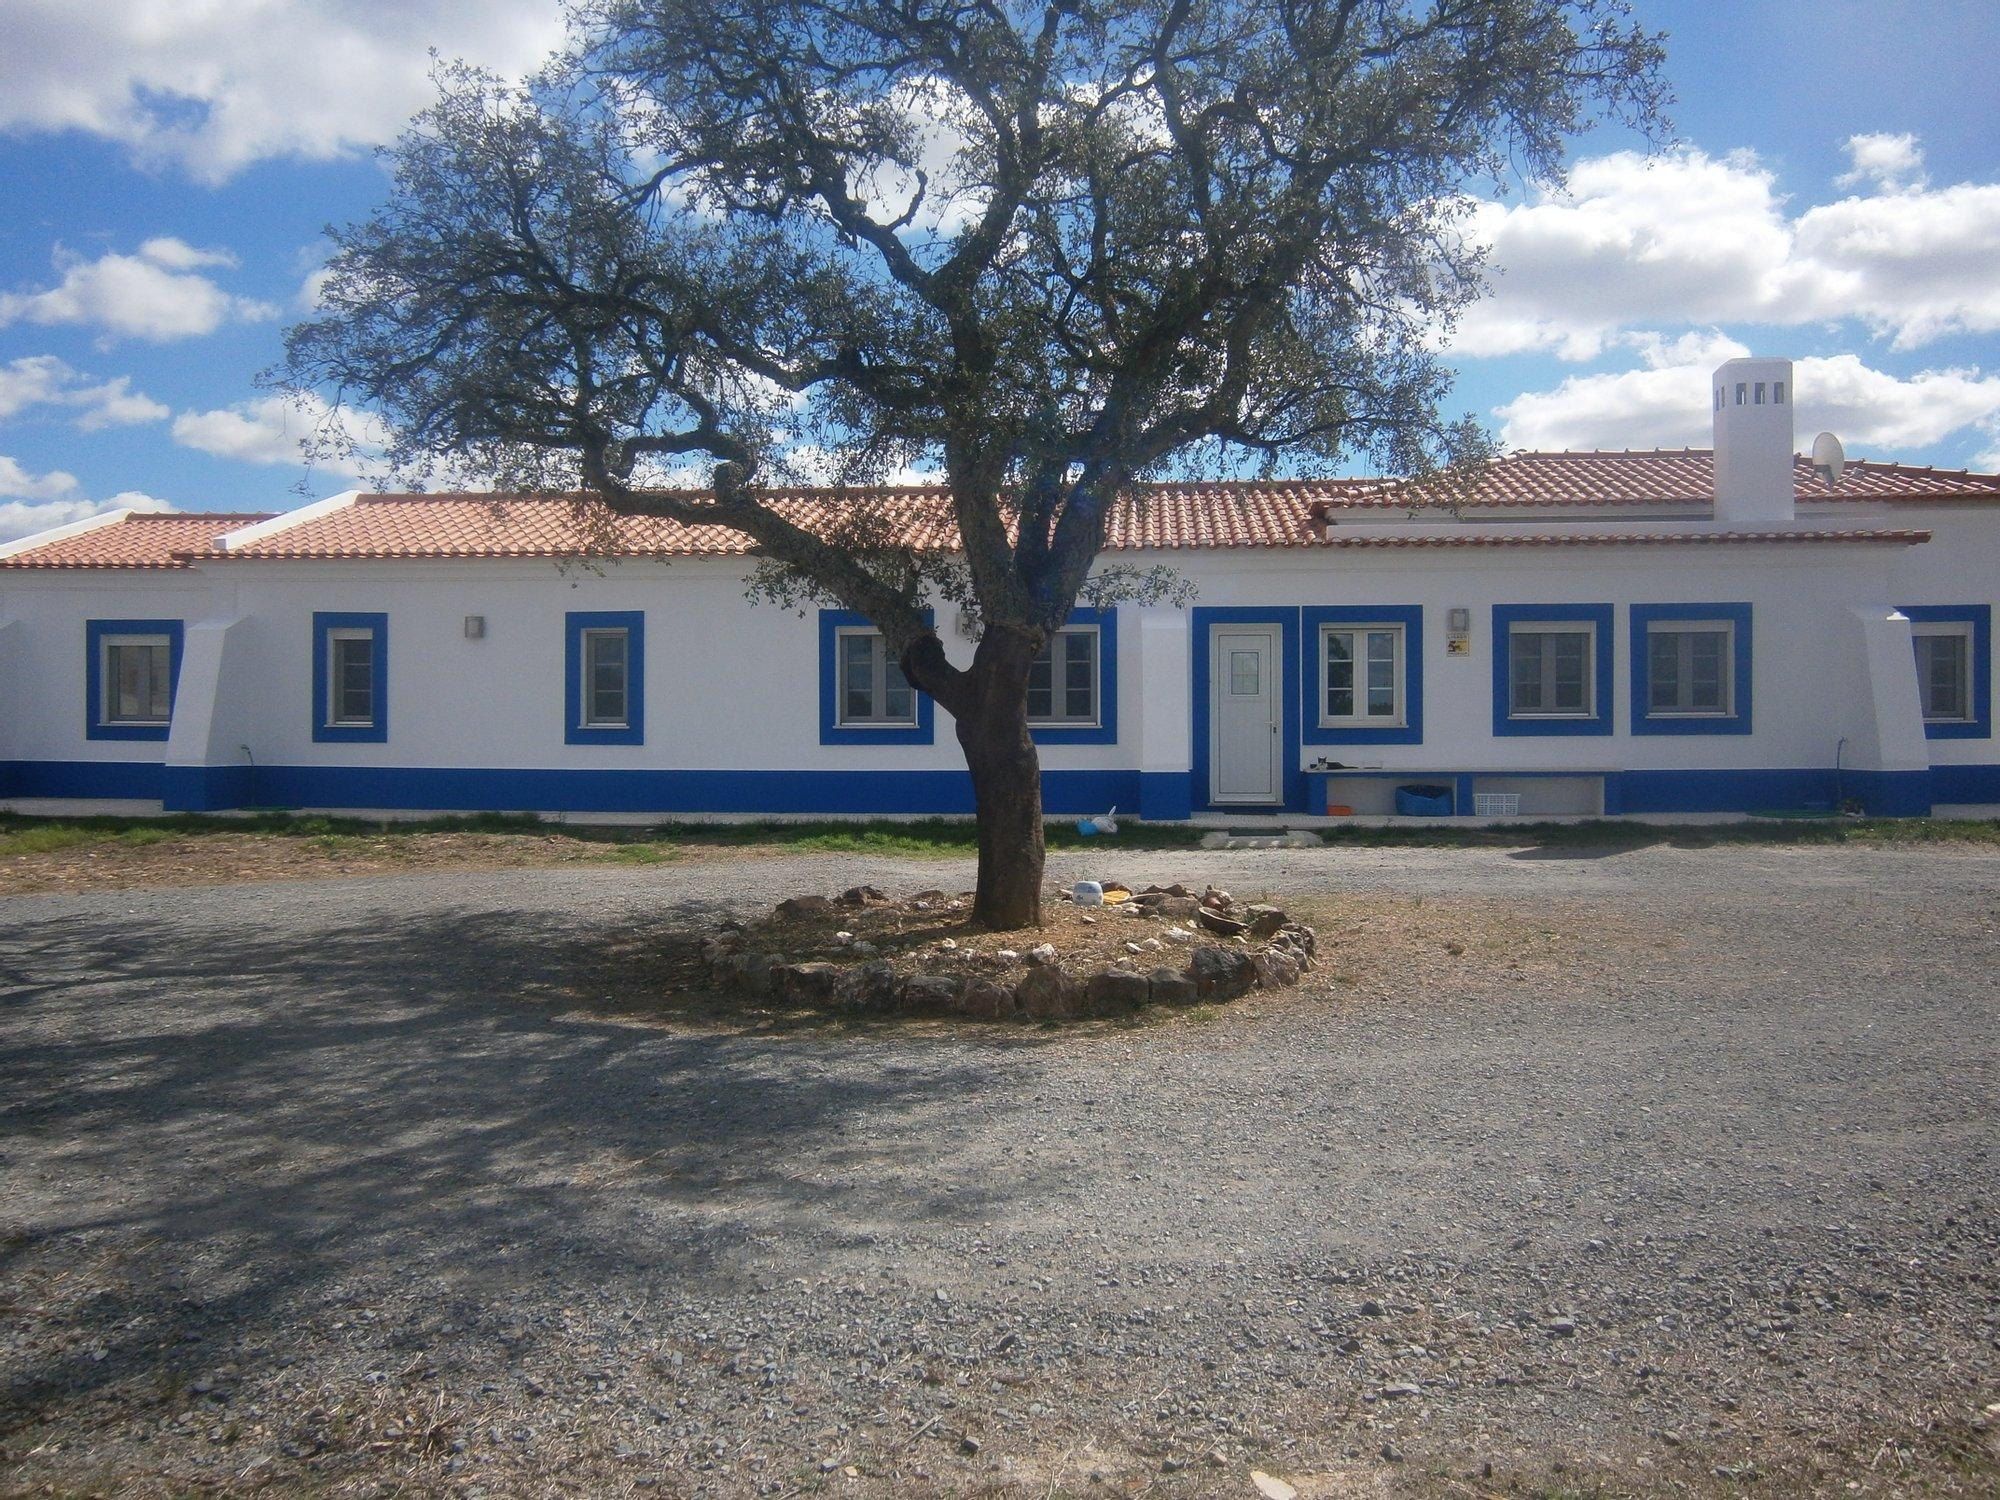 Grândola, Setubal, Portugal 1